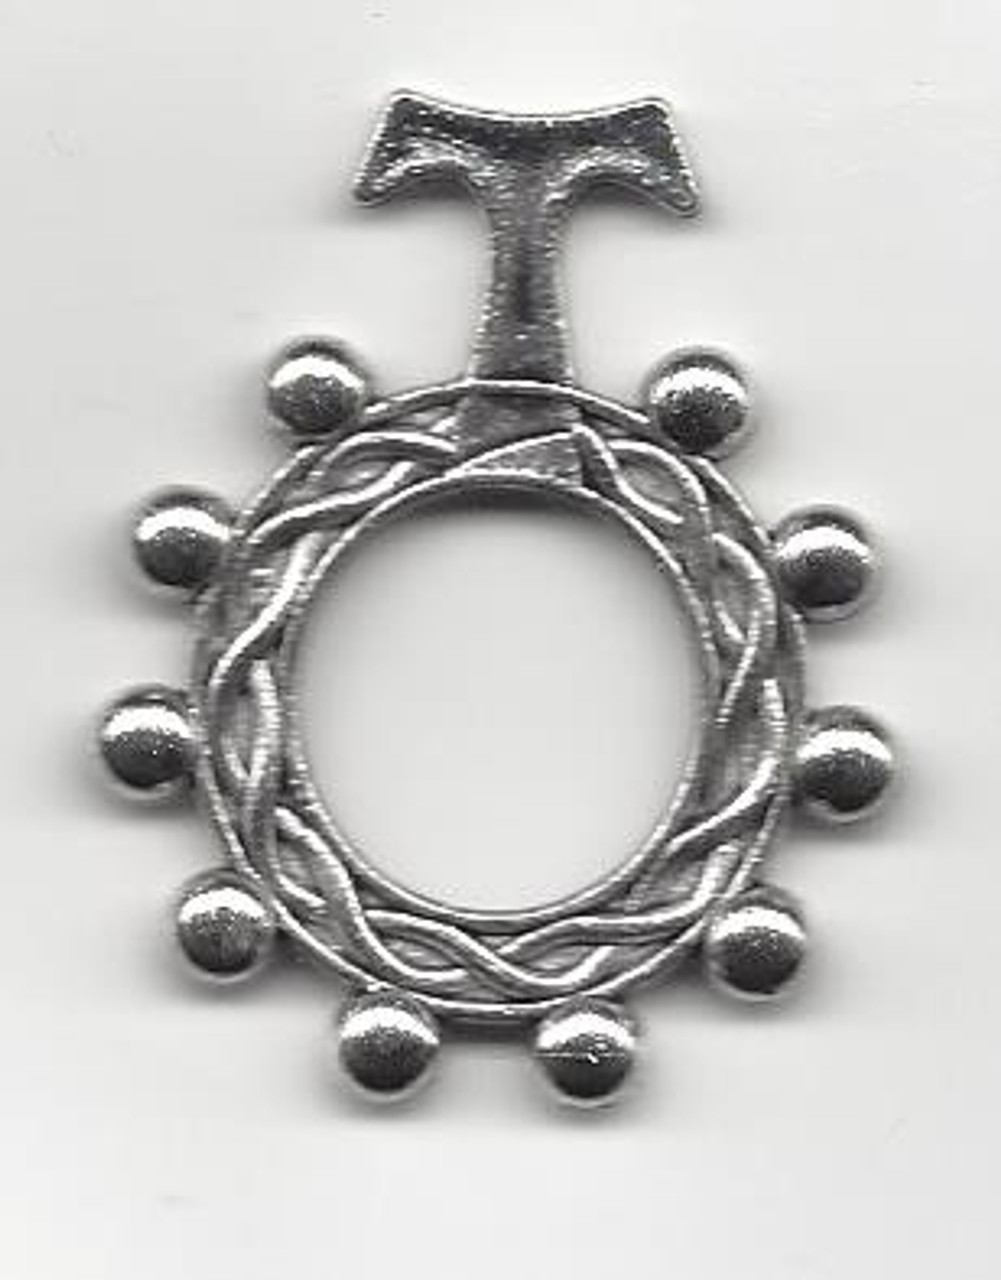 Tau Rosary Ring